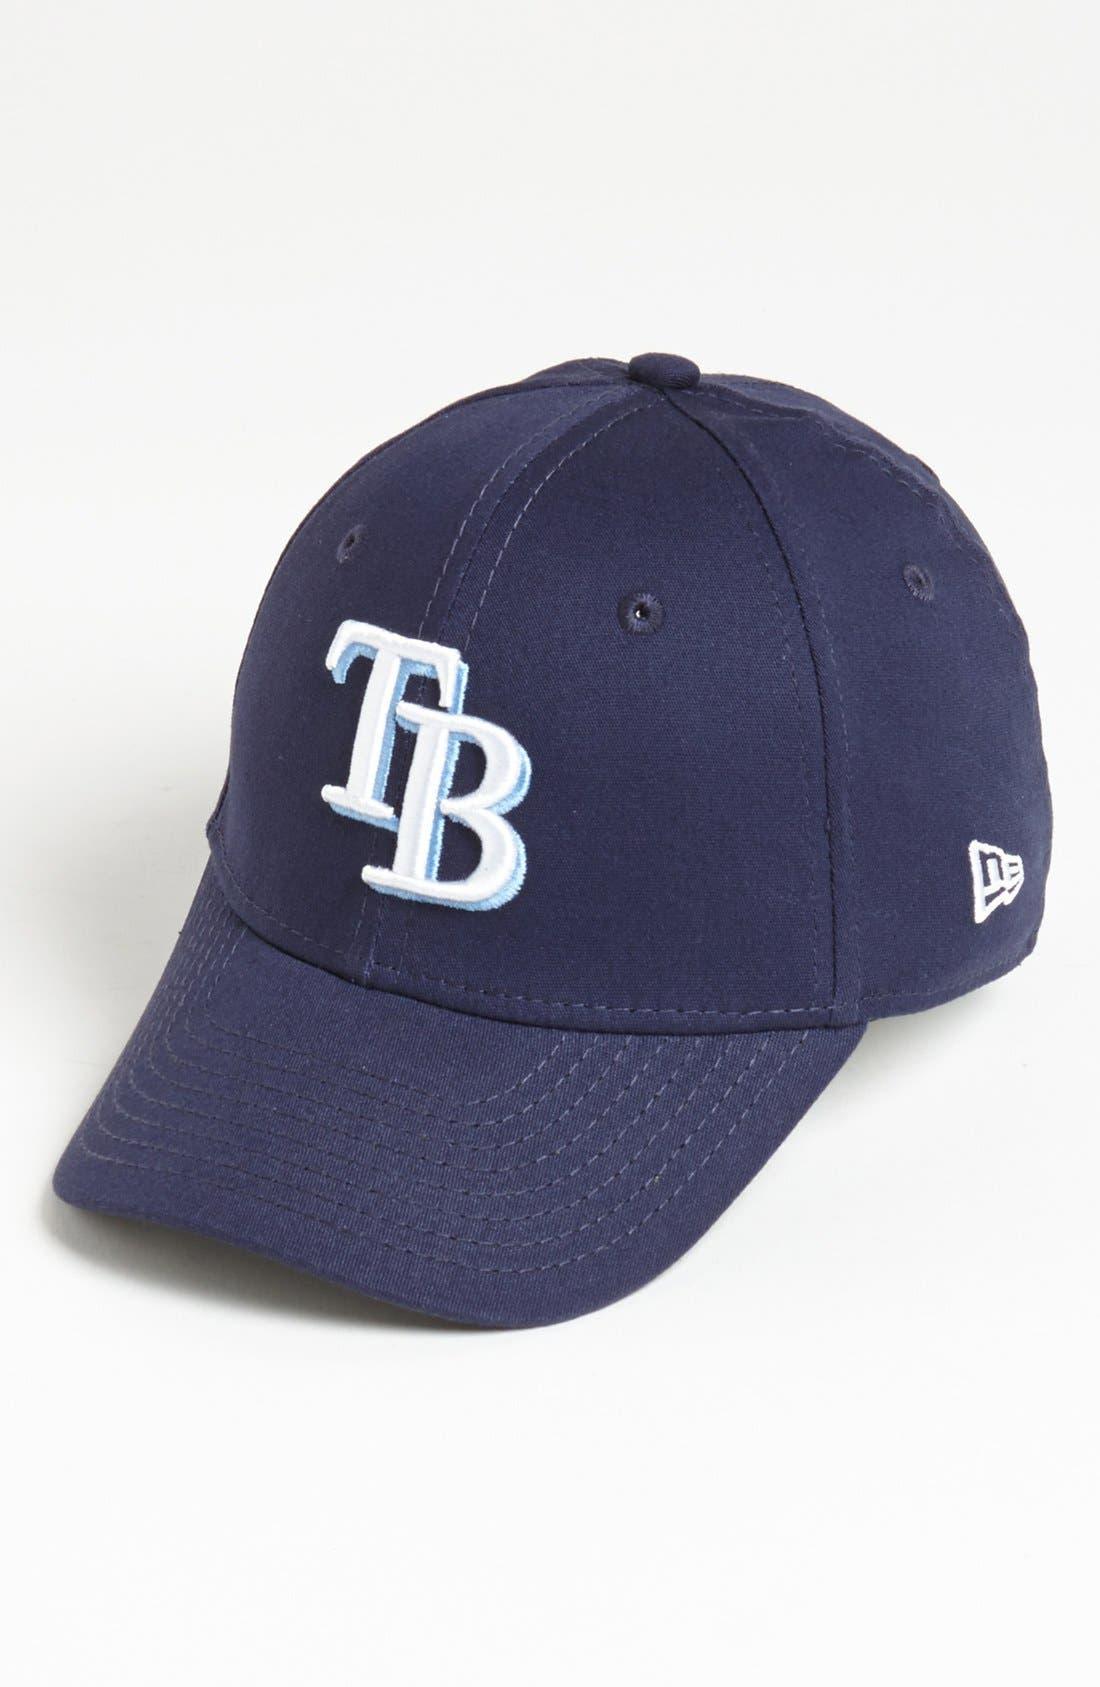 Alternate Image 1 Selected - New Era Cap 'Tampa Bay Rays - Tie Breaker' Baseball Cap (Big Boys)